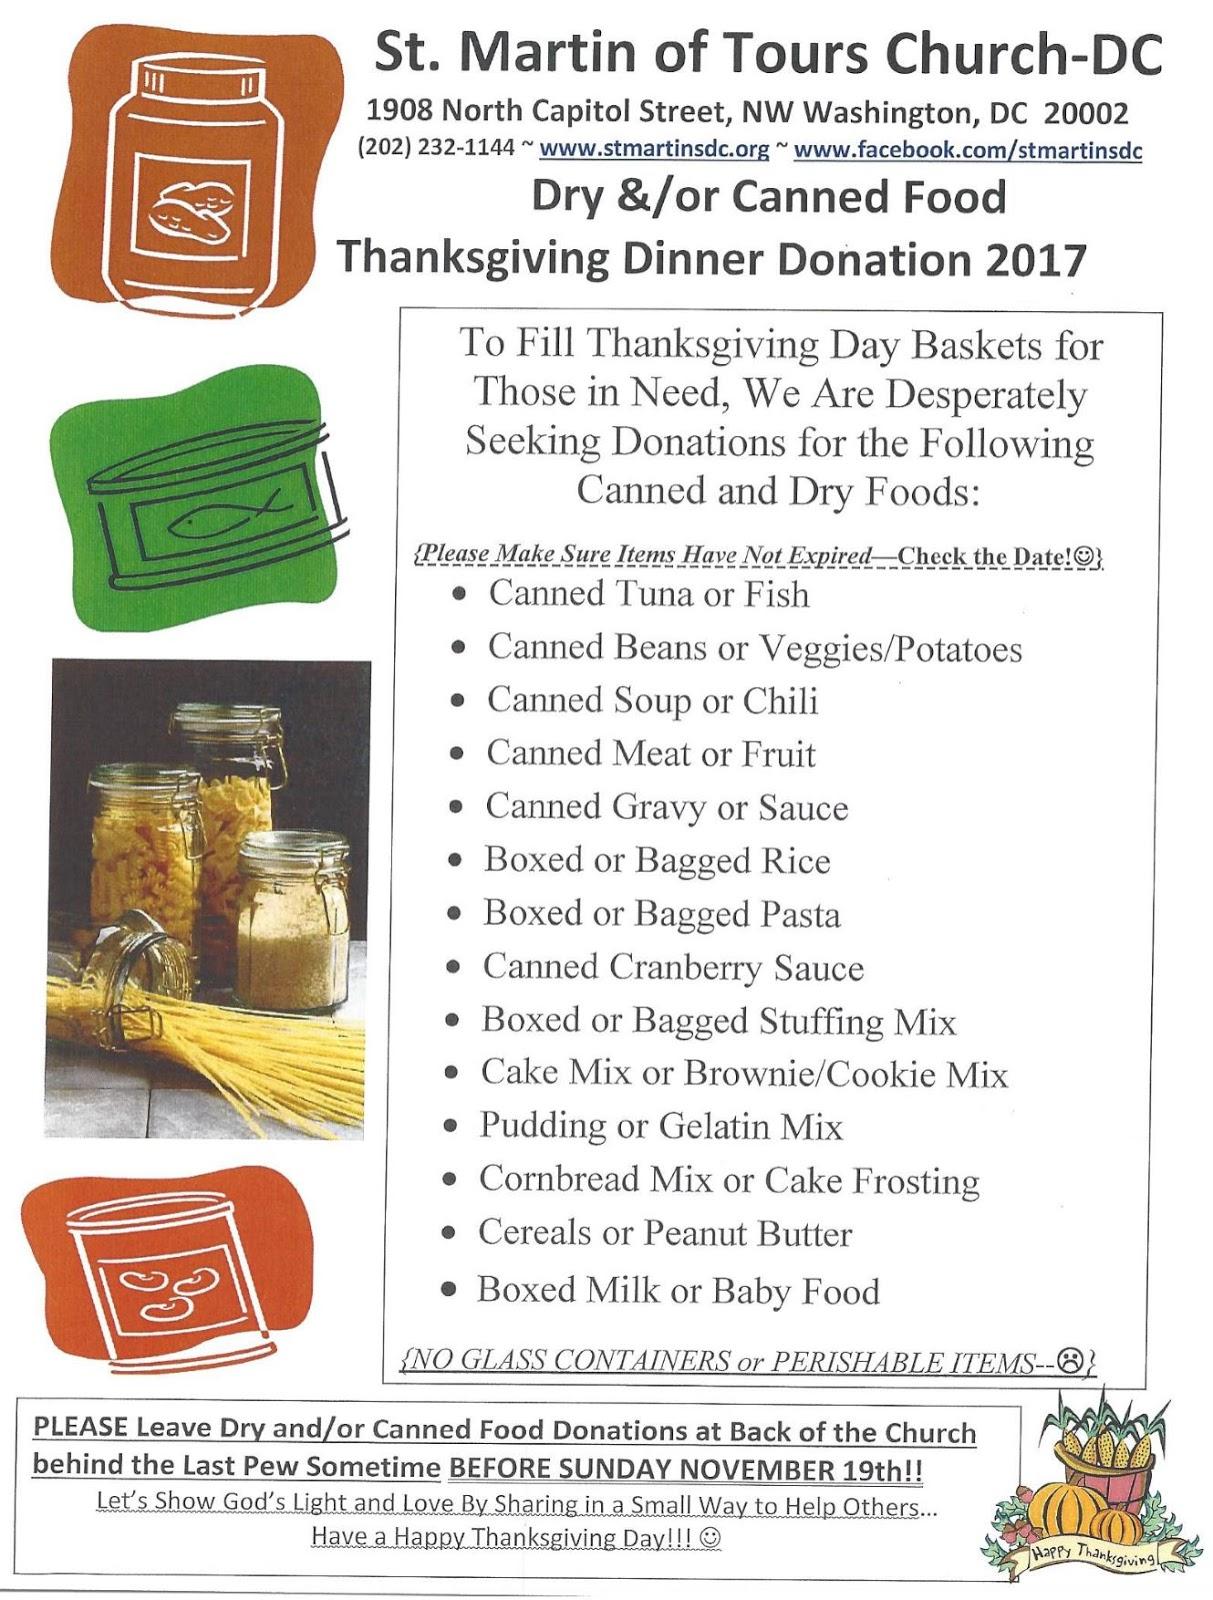 Truxton S Food Donations